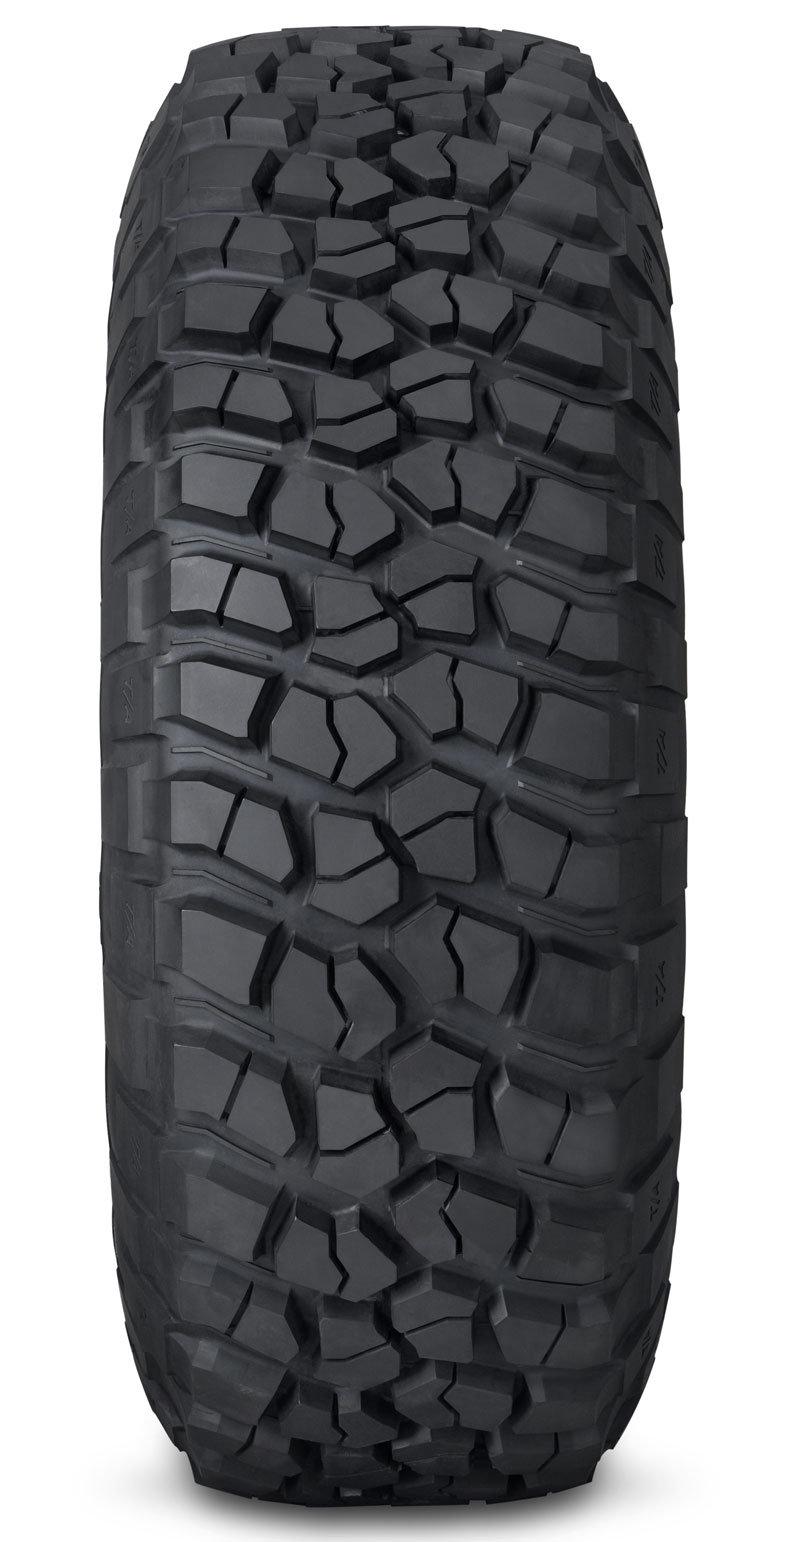 Neumático BF GOODRICH MUD TERRAIN T/A KM2 37/125R17 124 Q